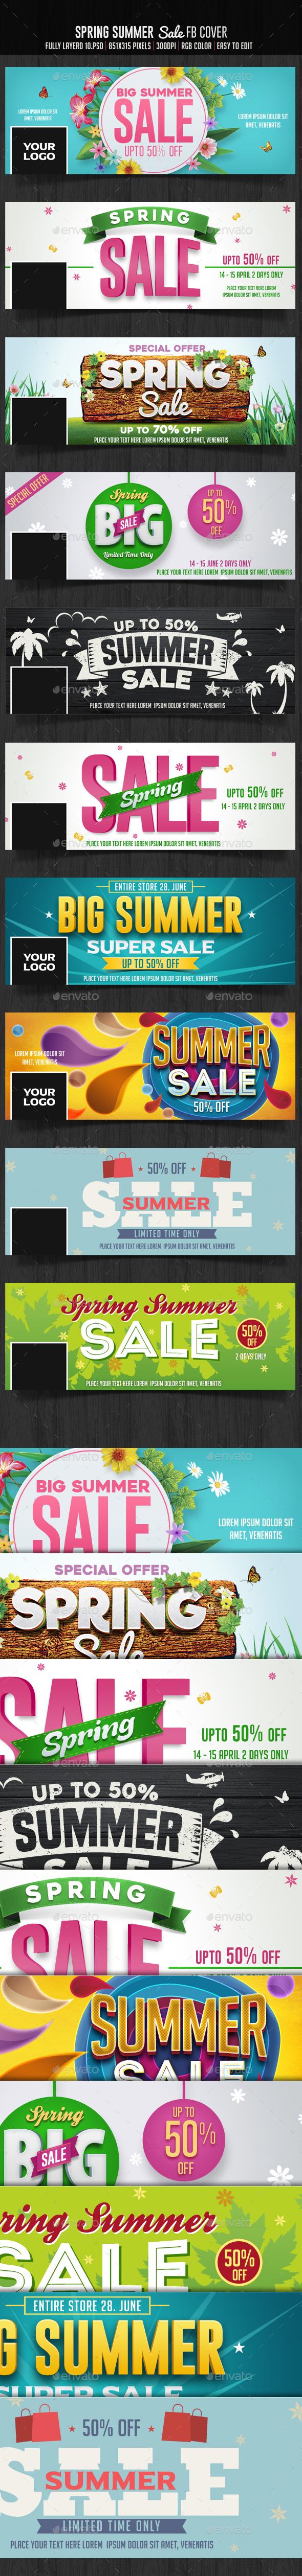 10 Spring Summer Sale Facebook Cover - Social Media Web Elements